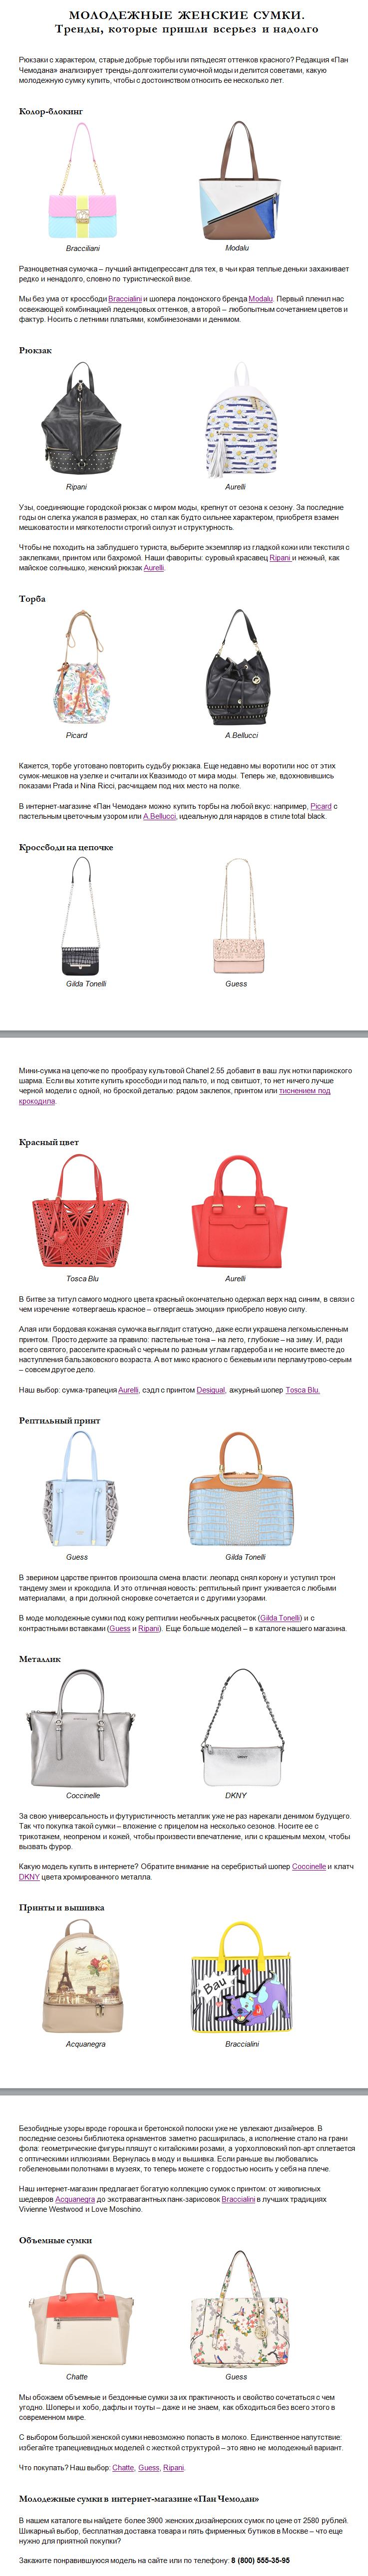 ddf5e560bf9f SEO/LSI статья для интернет-магазина сумок и багажа о модных трендах